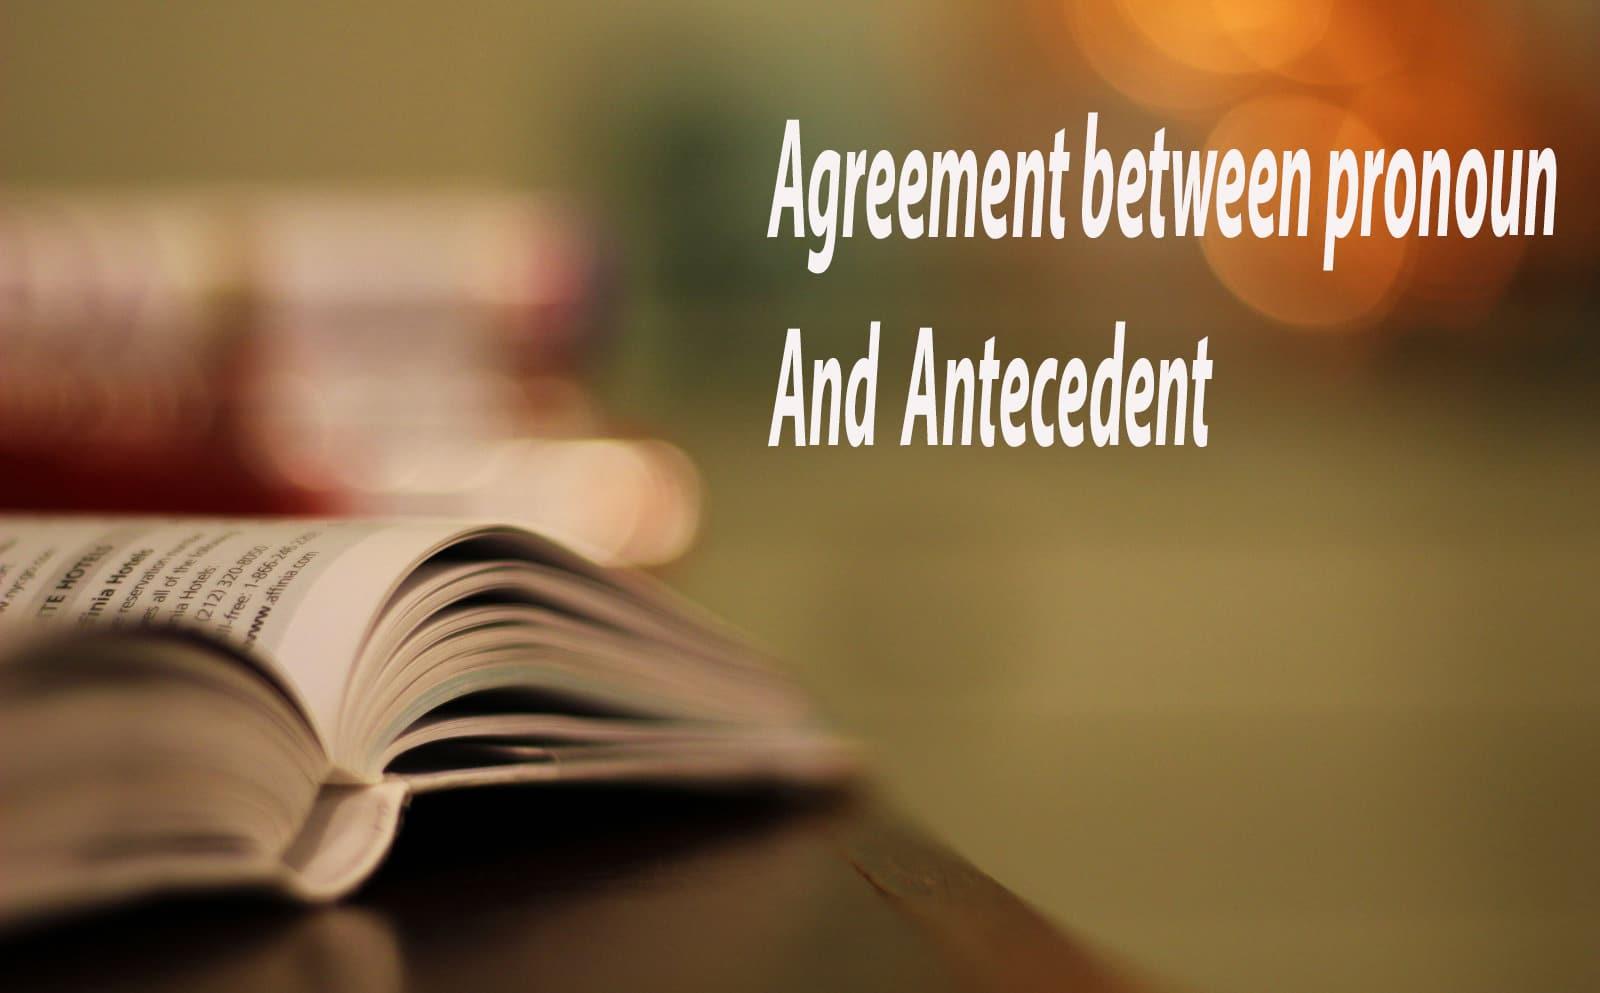 agreement between pronoun